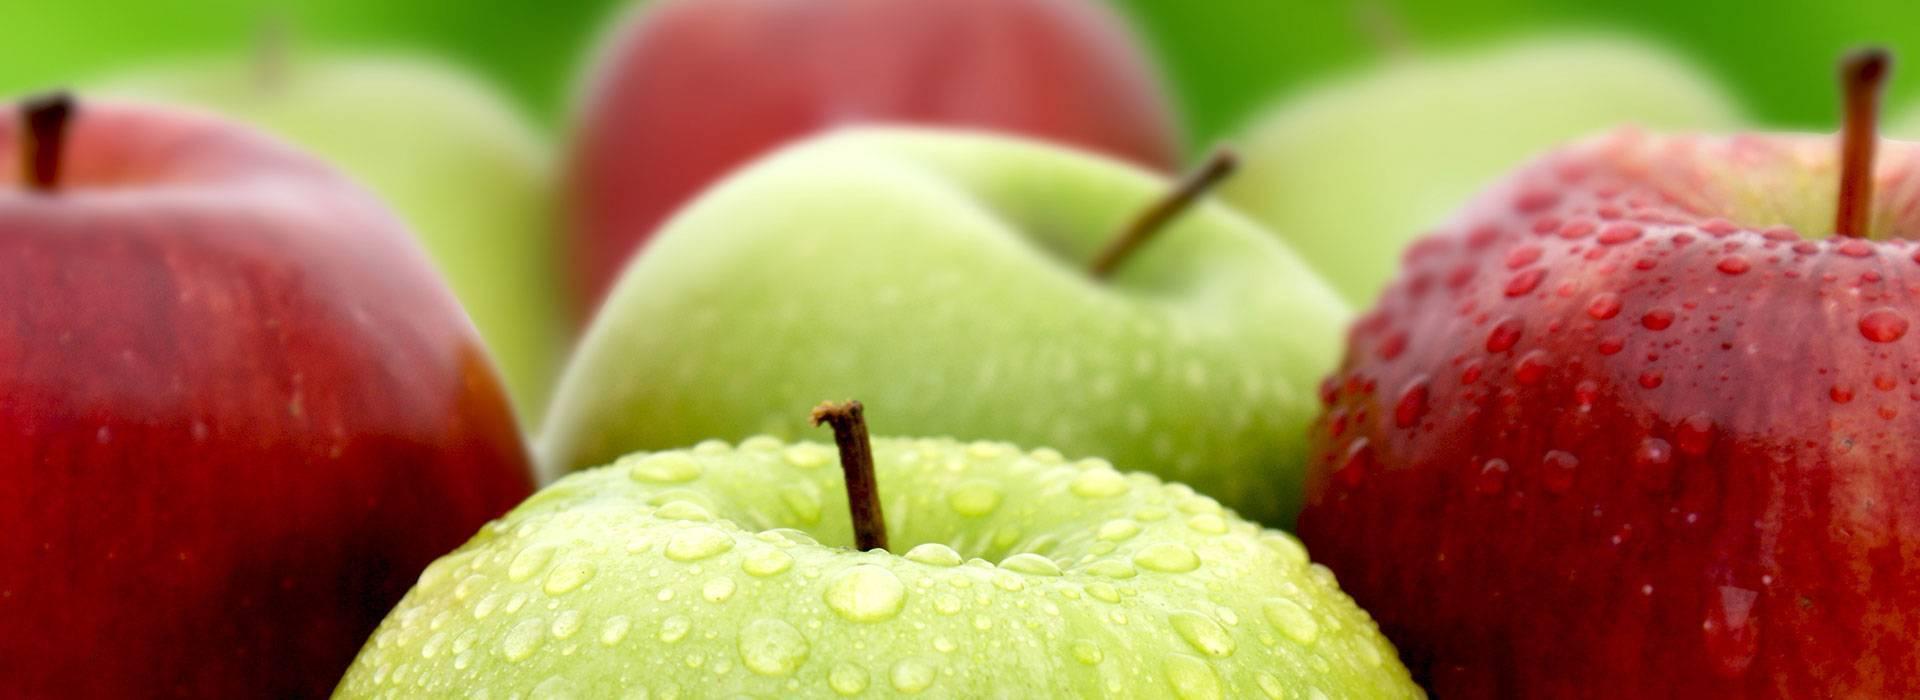 Programa Estilo de Vida Saudável e Perda de Peso